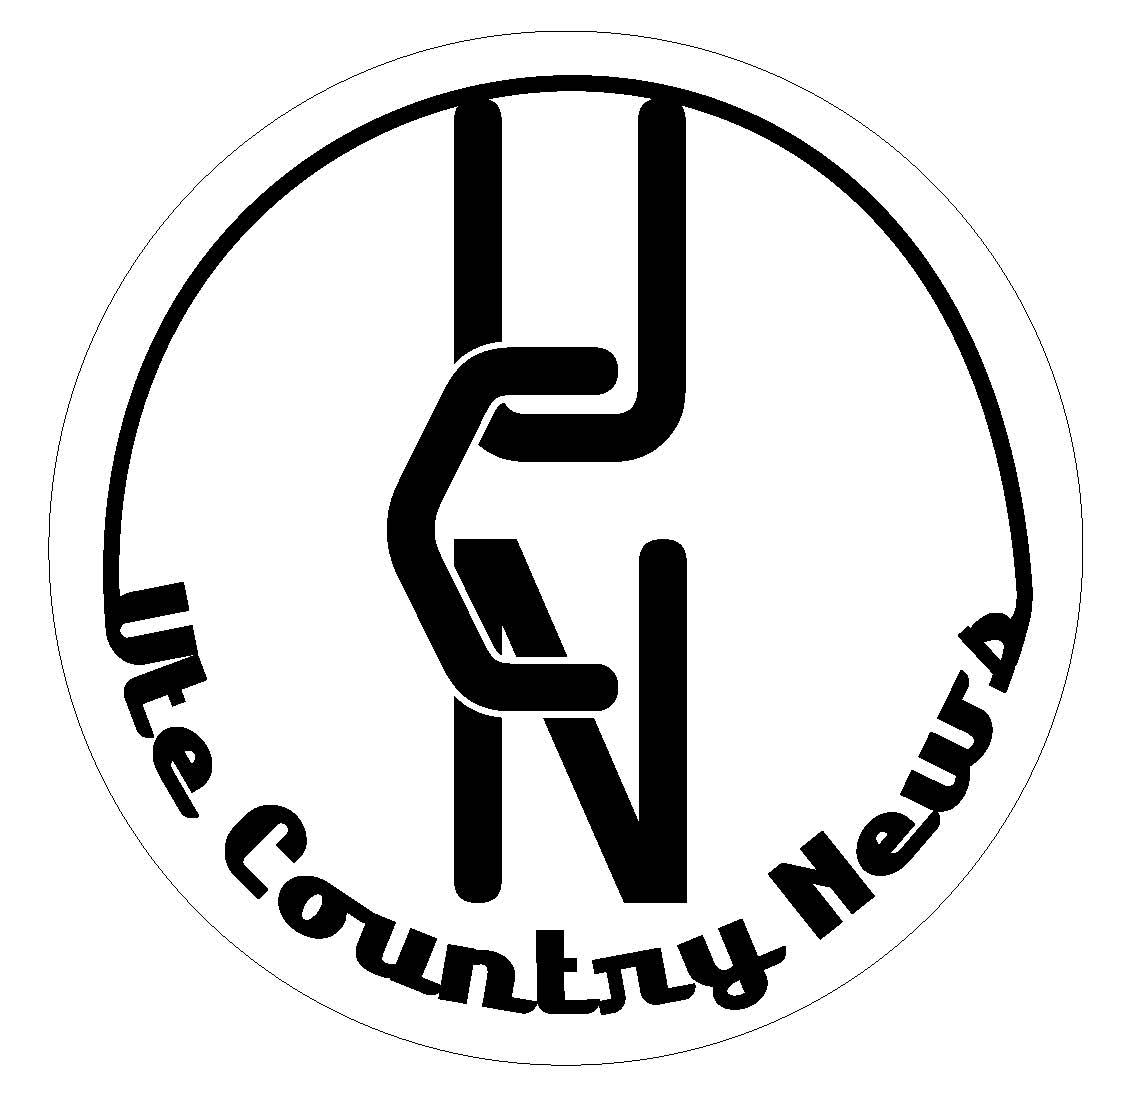 Ute Country News, dba High Pine Design